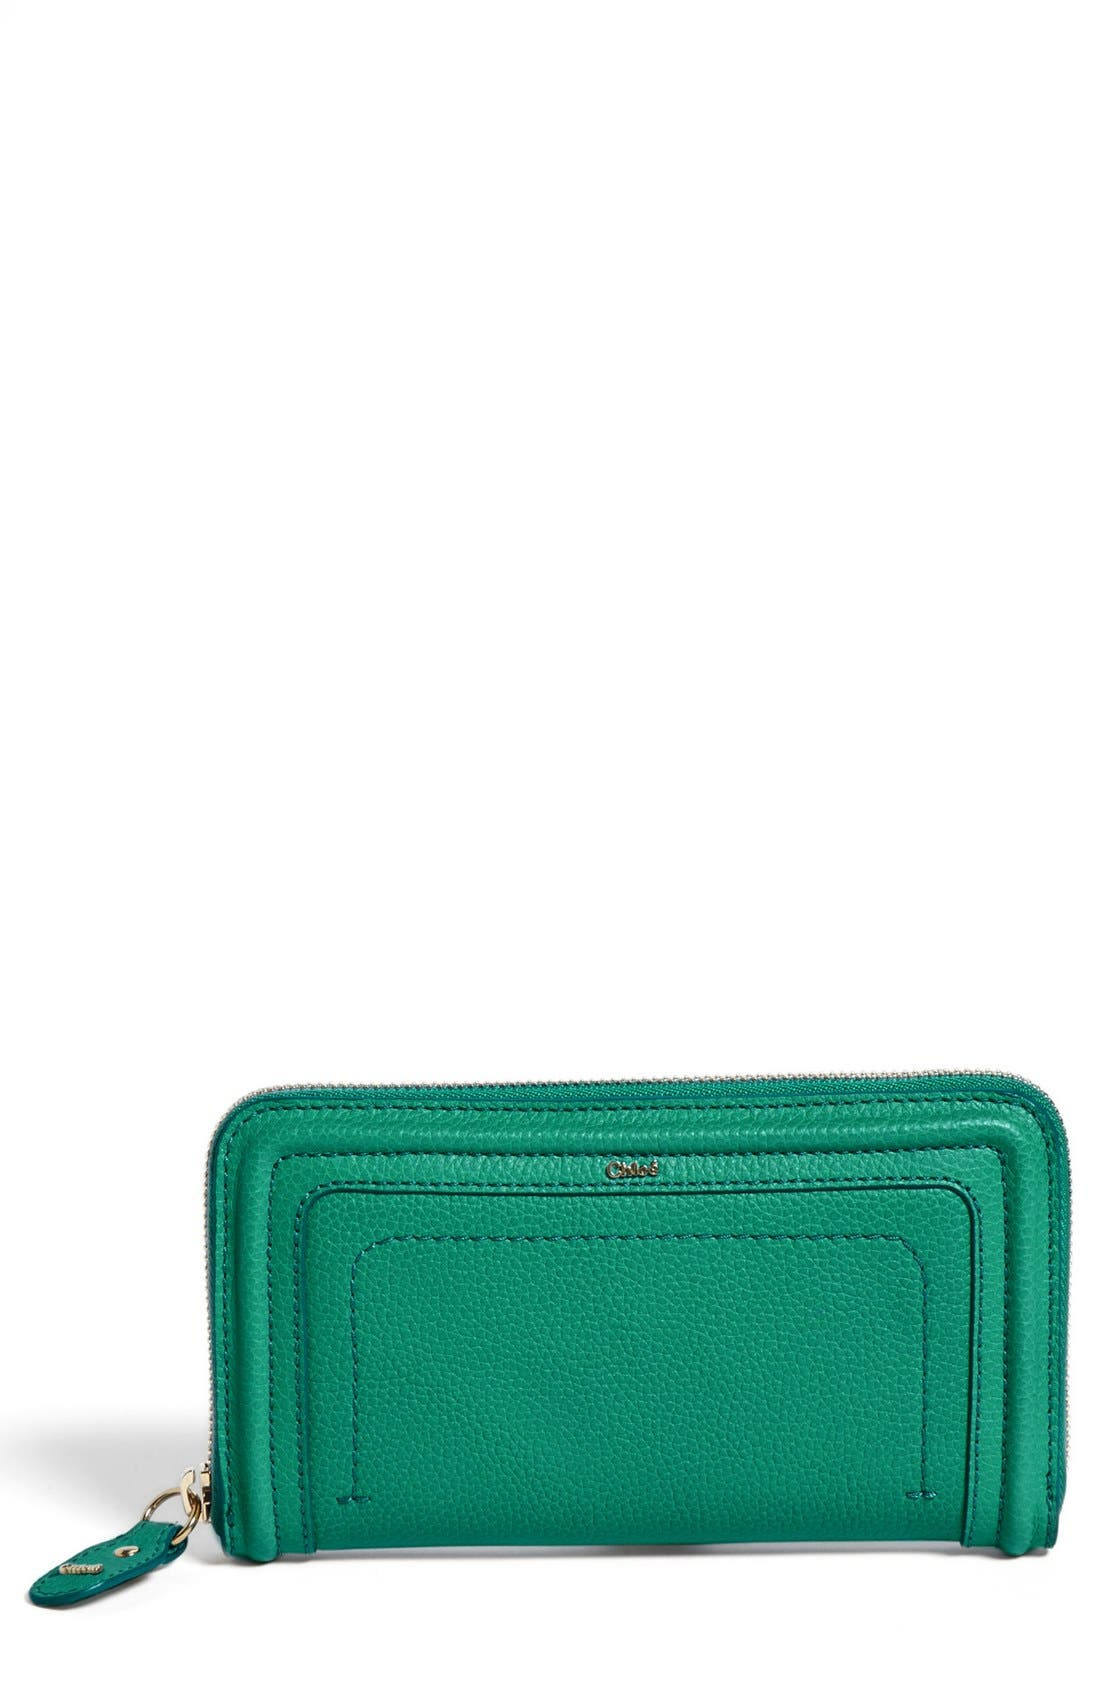 Main Image - Chloé 'Paraty' Zip Around Calfskin Leather Wallet